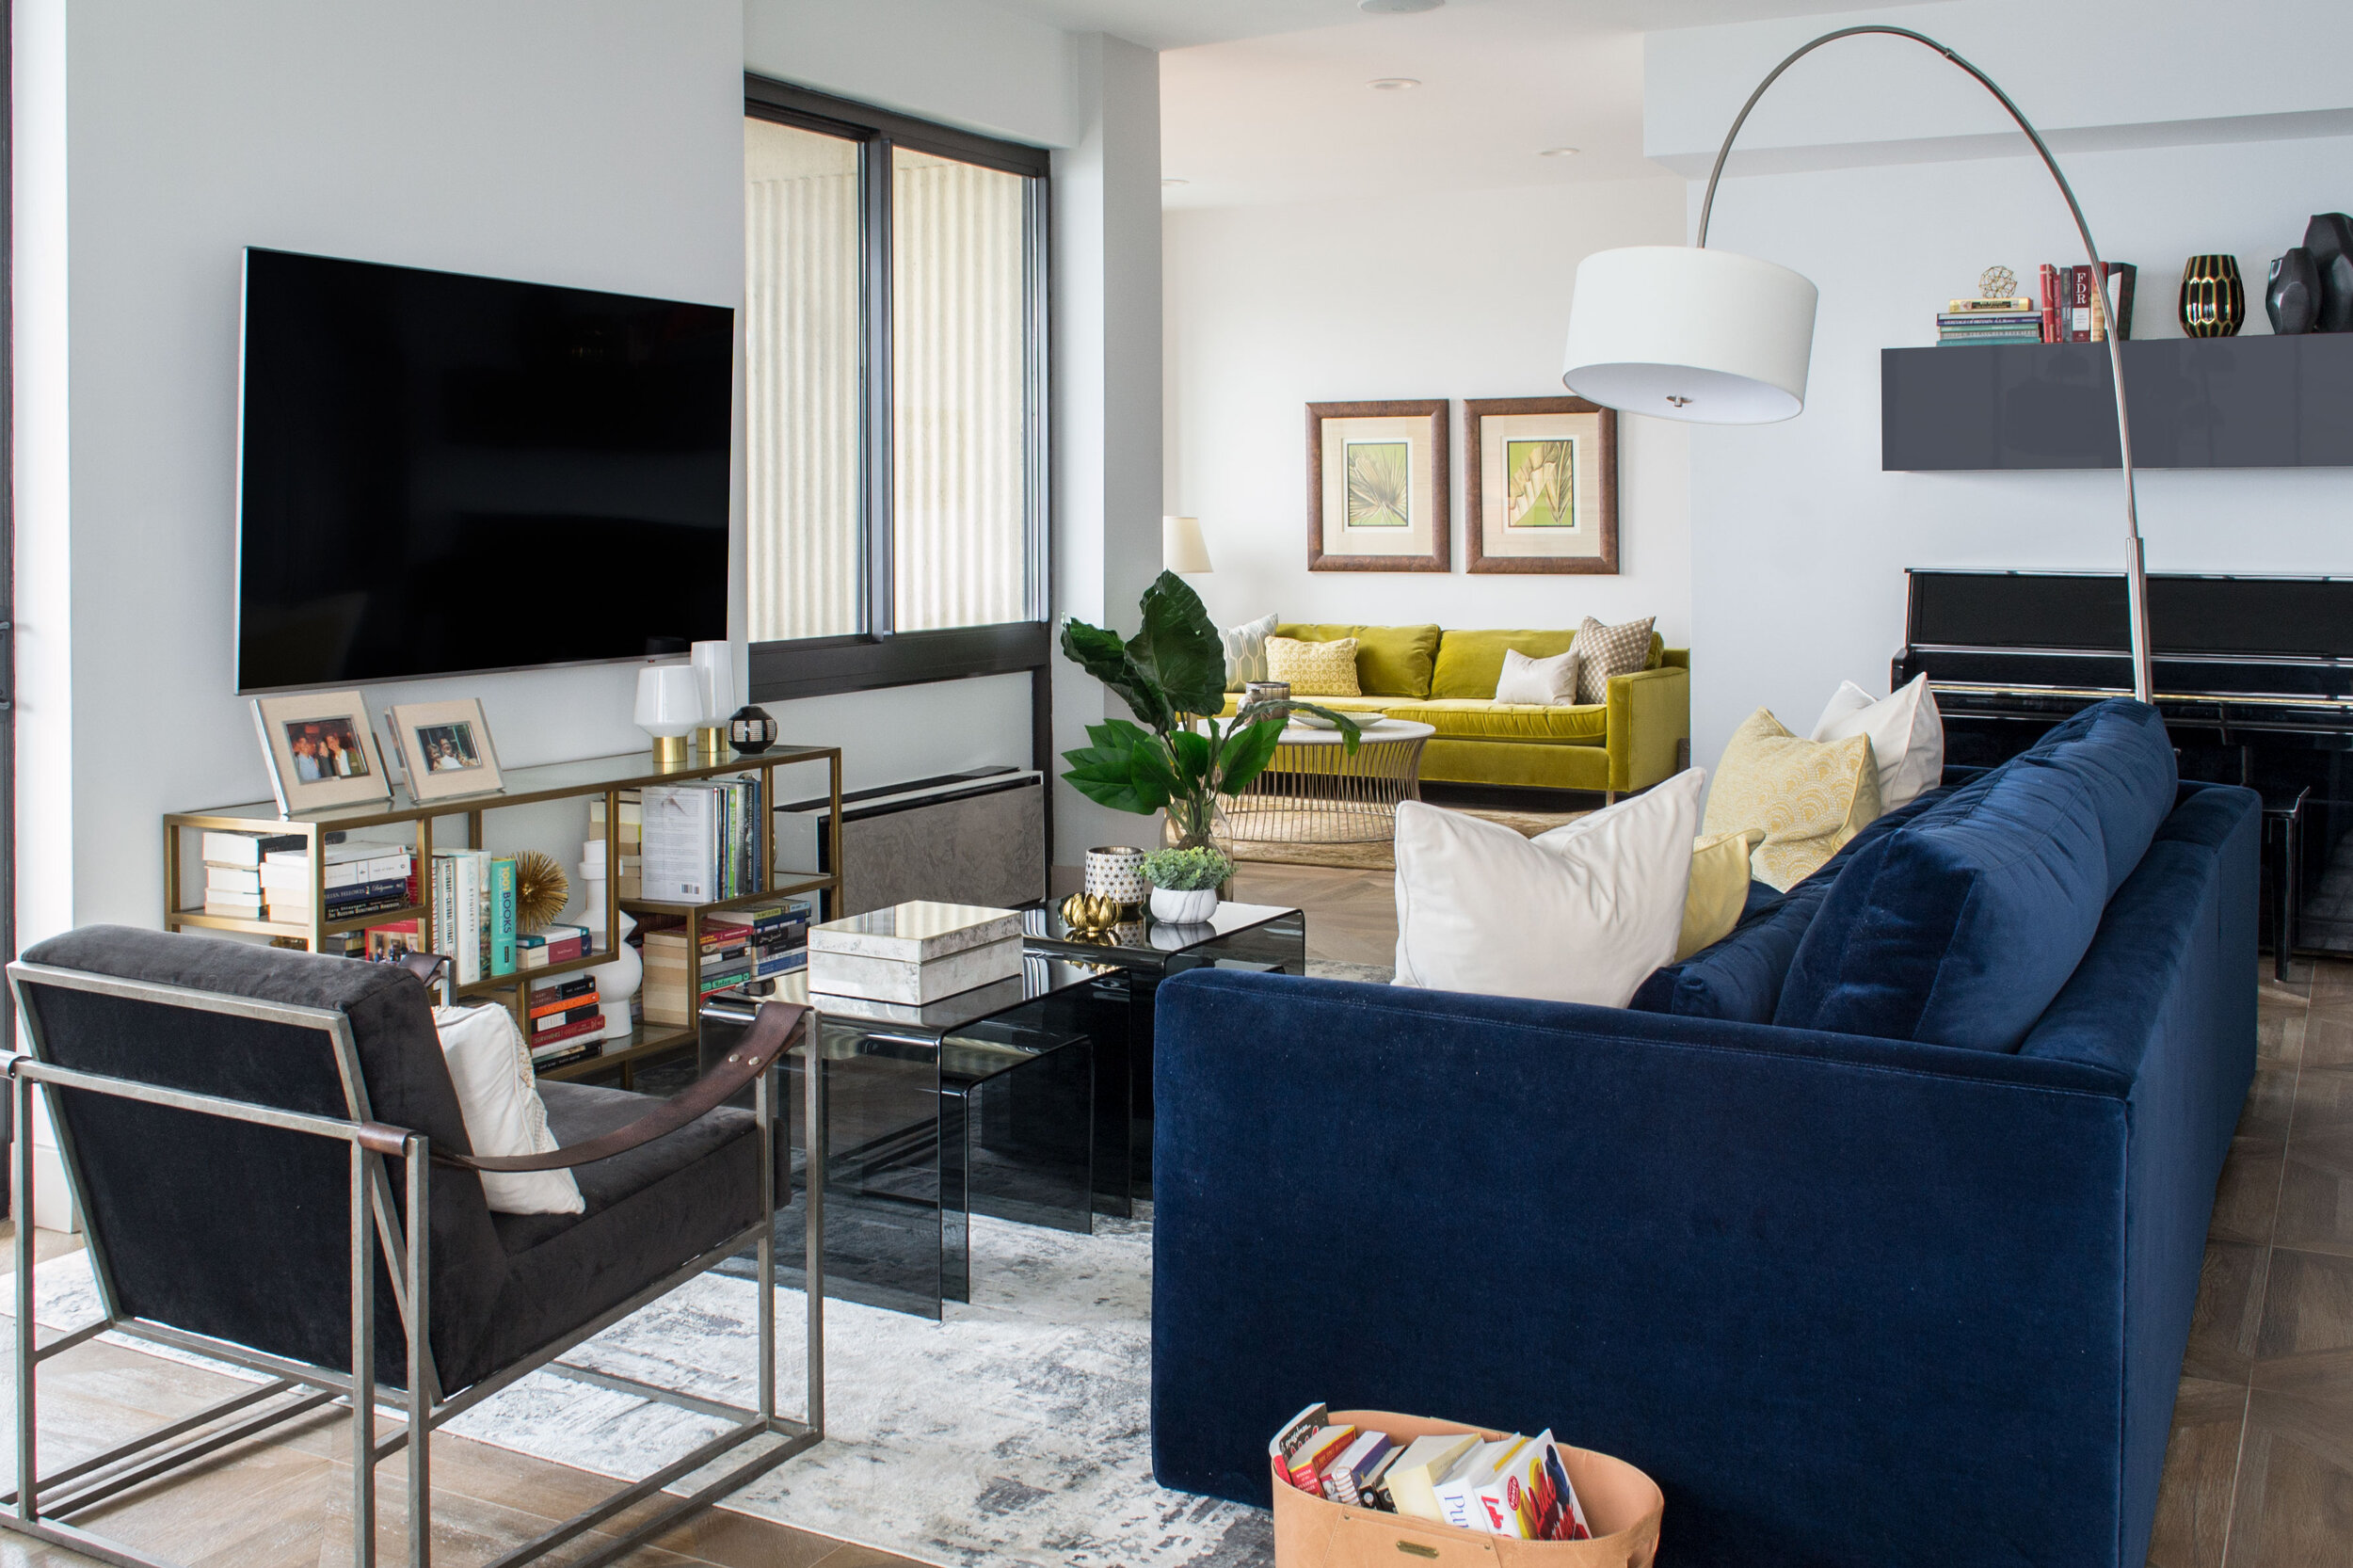 living-room-navy-tc-interiors-1.jpg